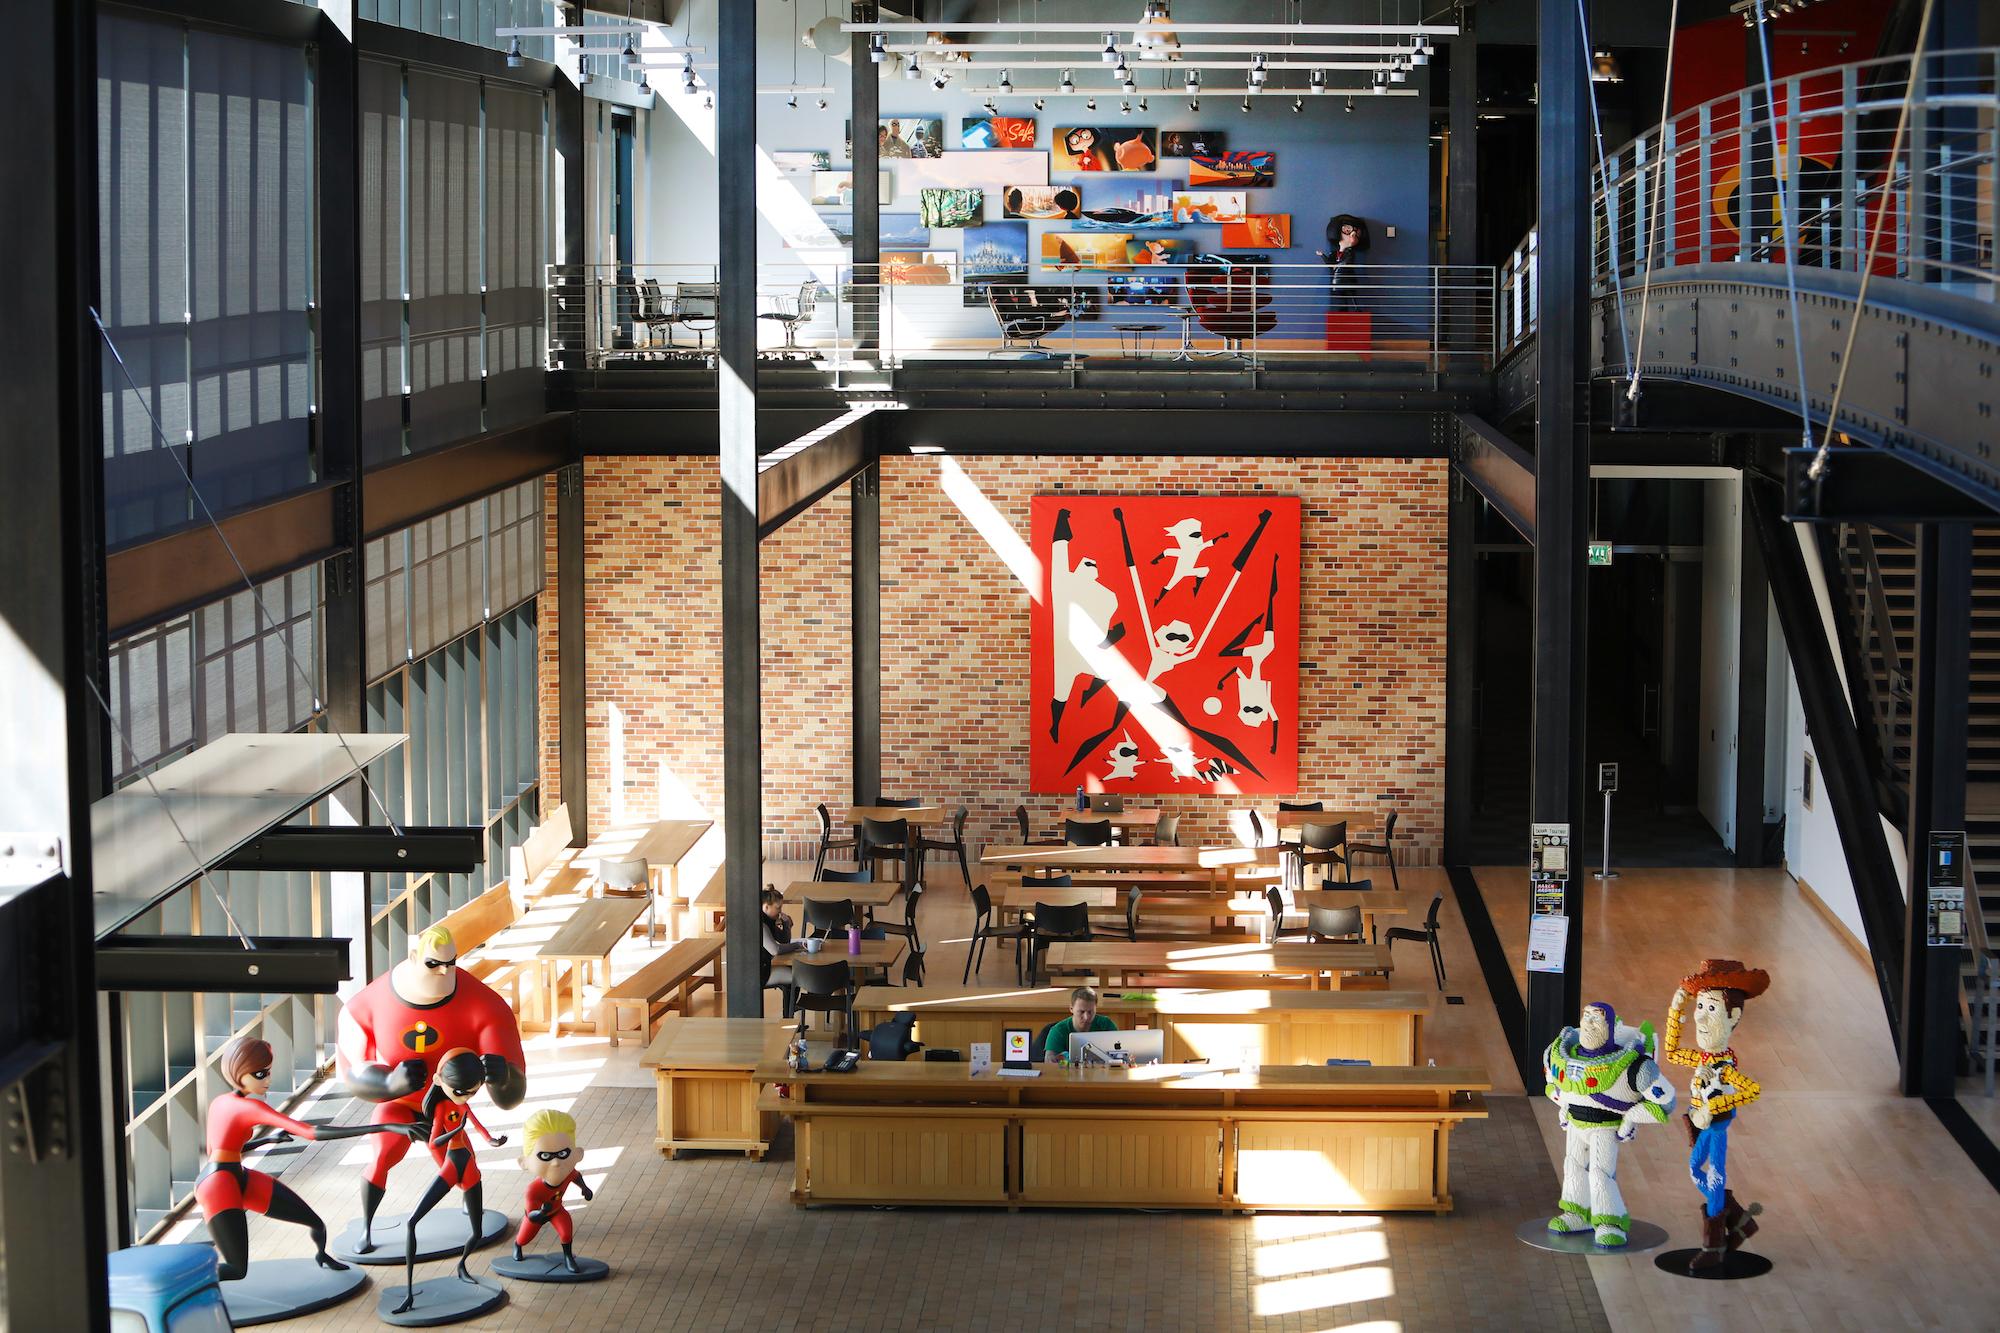 Incredibles 2 Concept Art in Steve Jobs Building